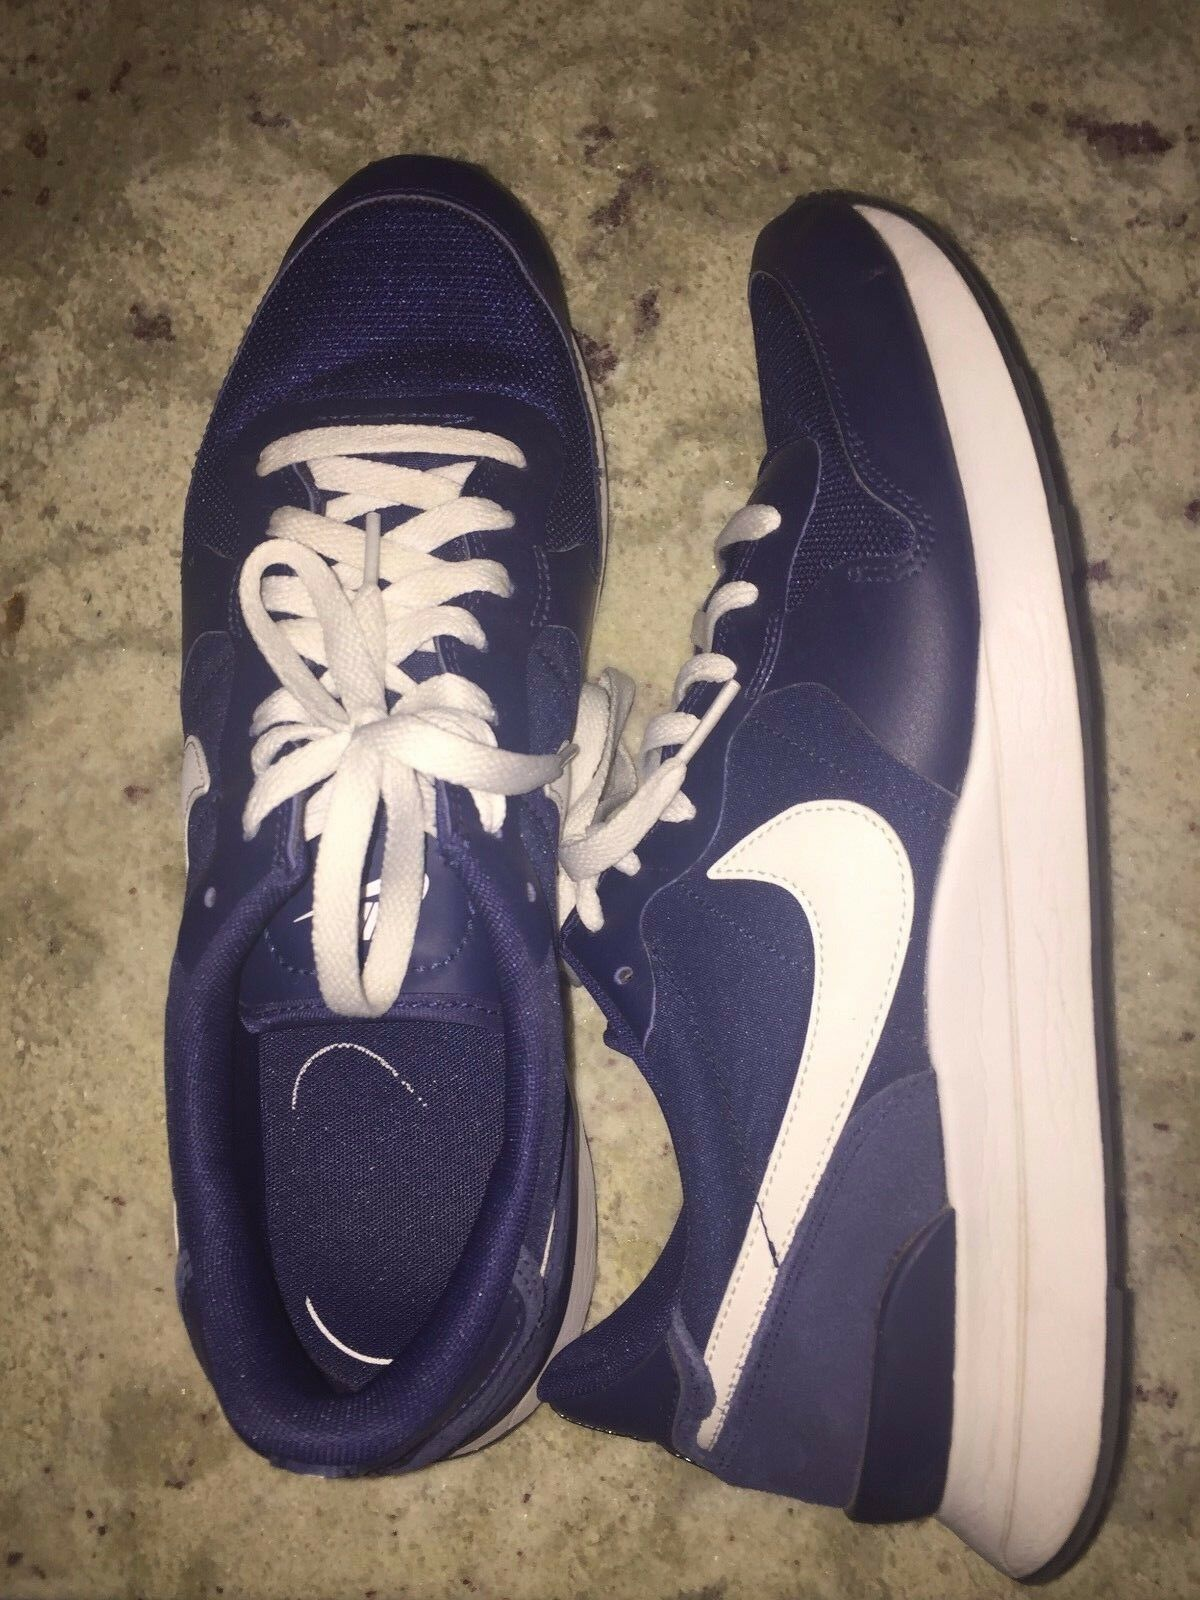 Mens Nike Internationalist Sneakers 10.5 Blue White Sz US 10.5 Sneakers Running Sport Training 61464e